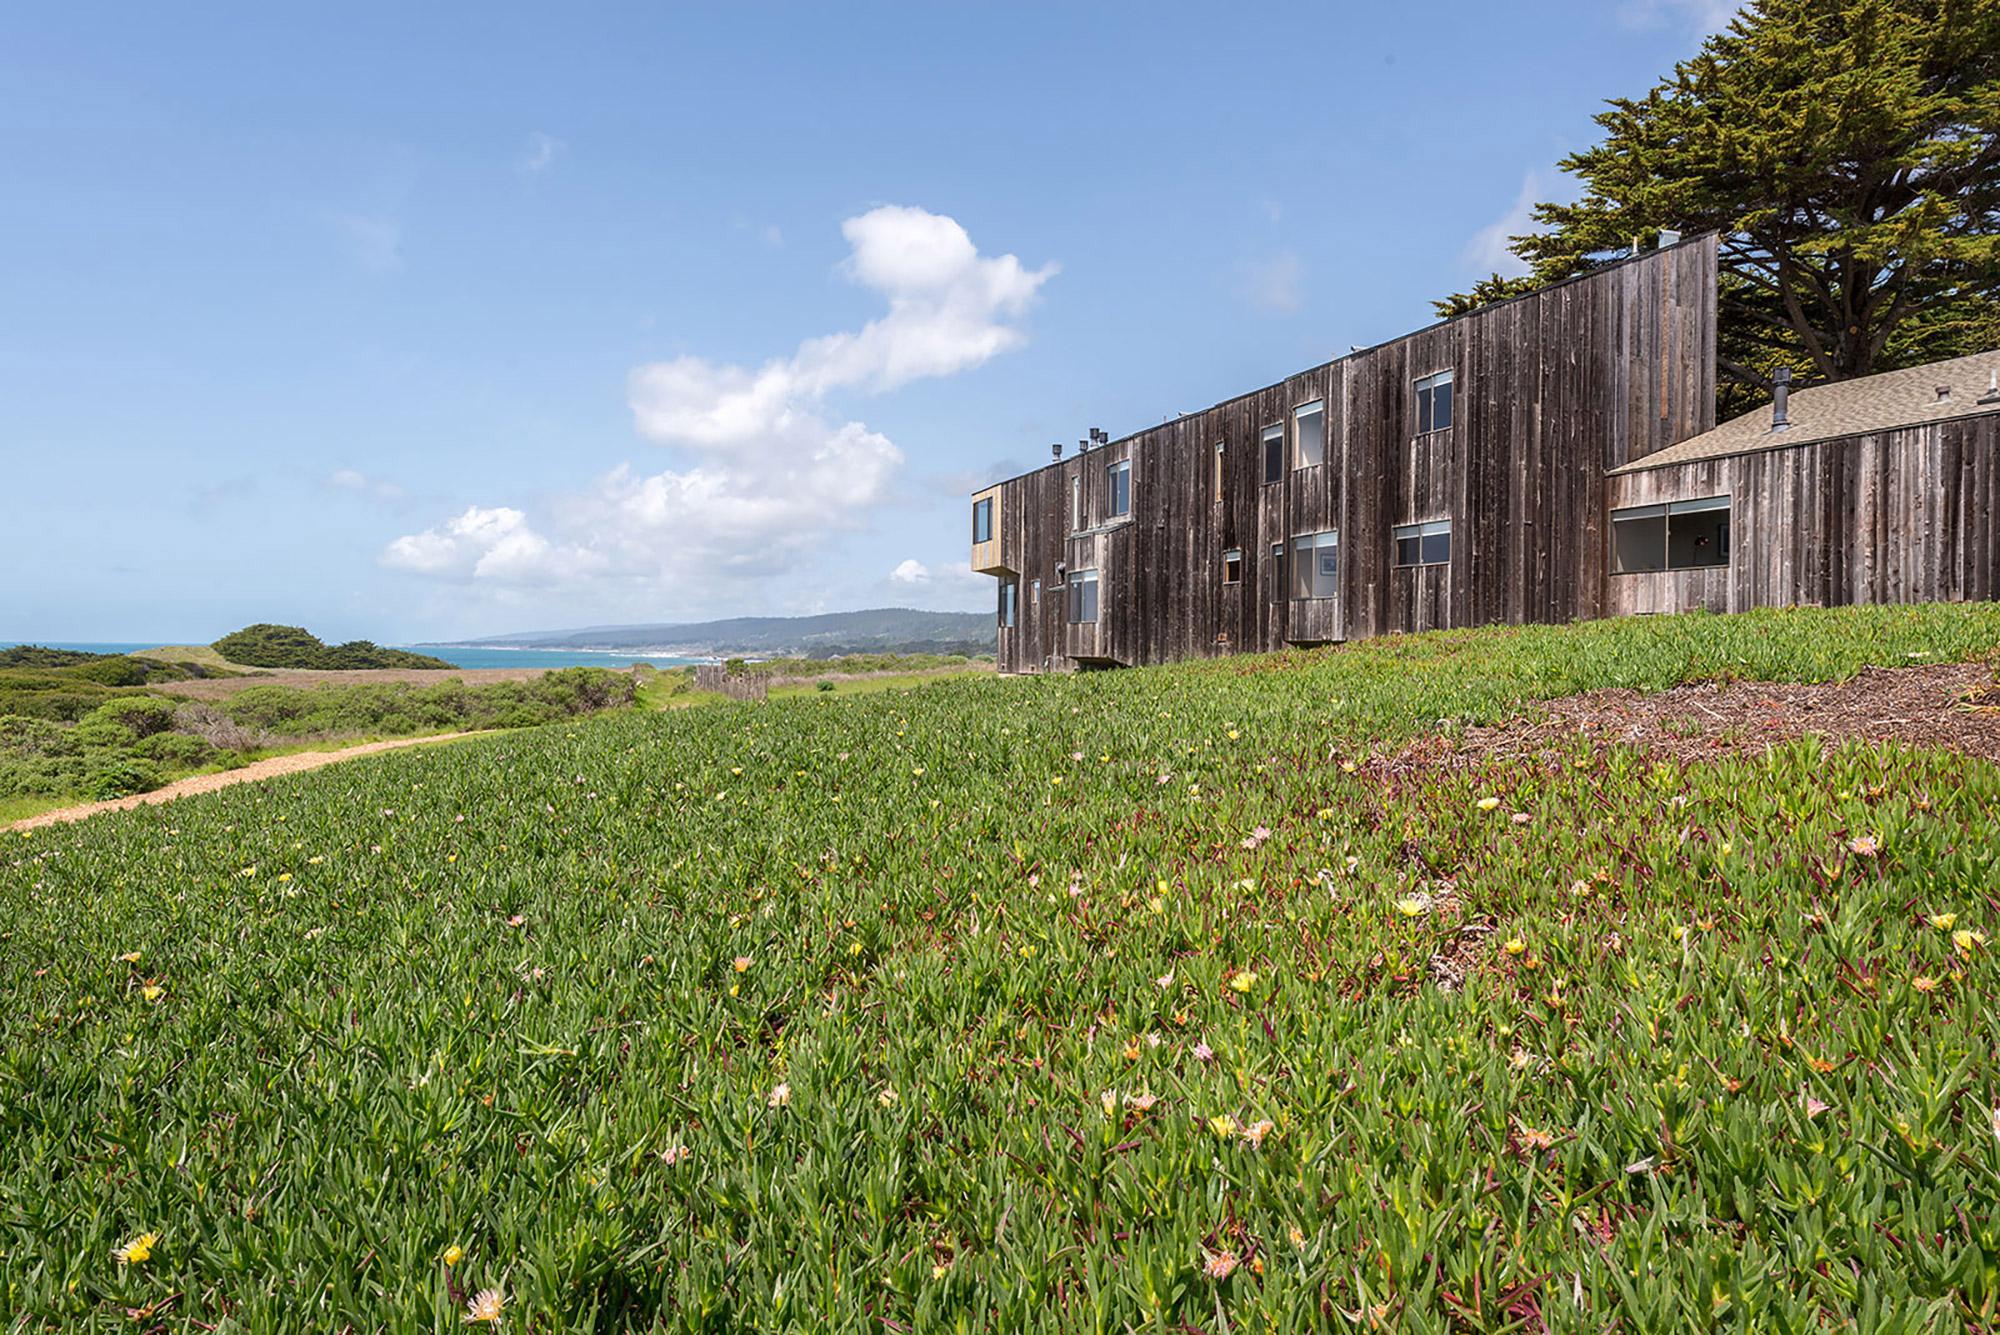 Sea-Ranch-Lodge-Spring-2018-01-AvL.jpg